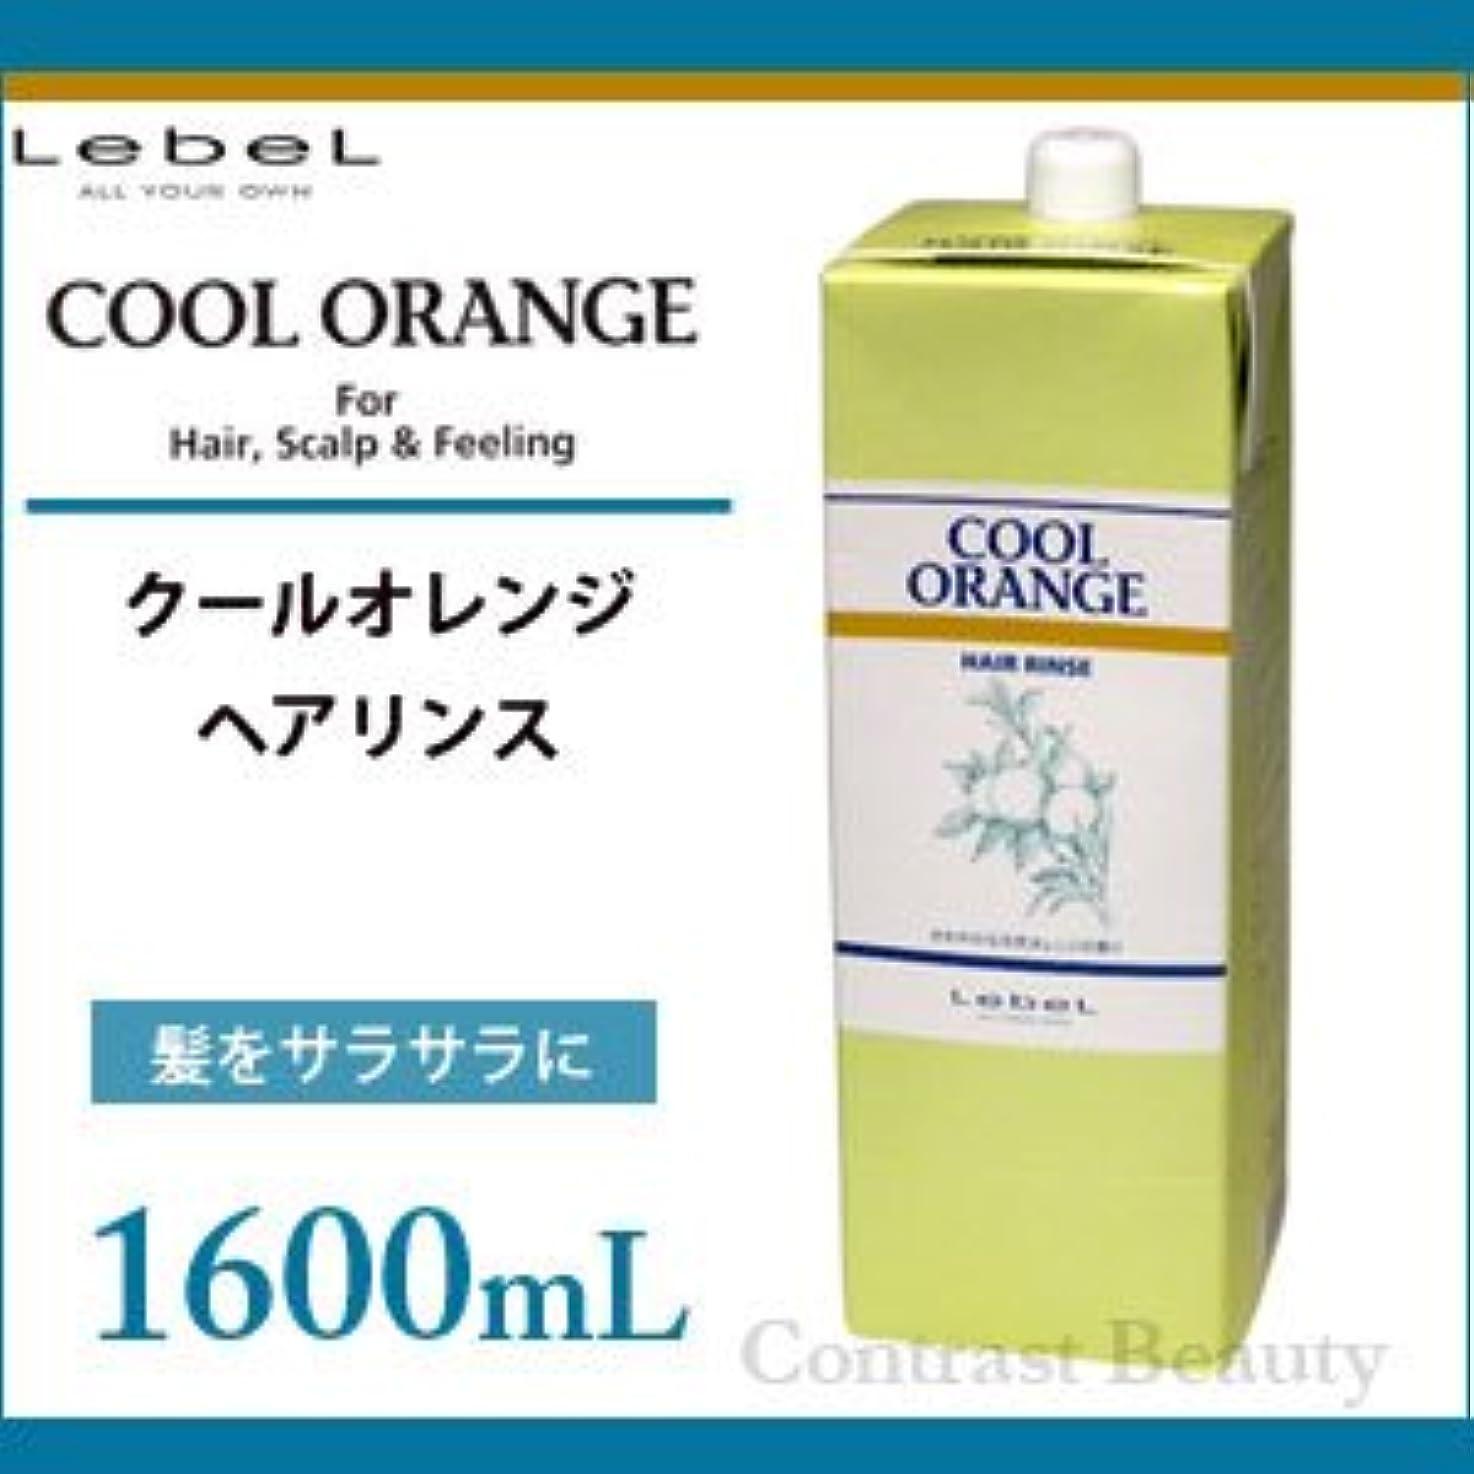 【X3個セット】 ルベル クールオレンジ ヘアリンス 1600ml